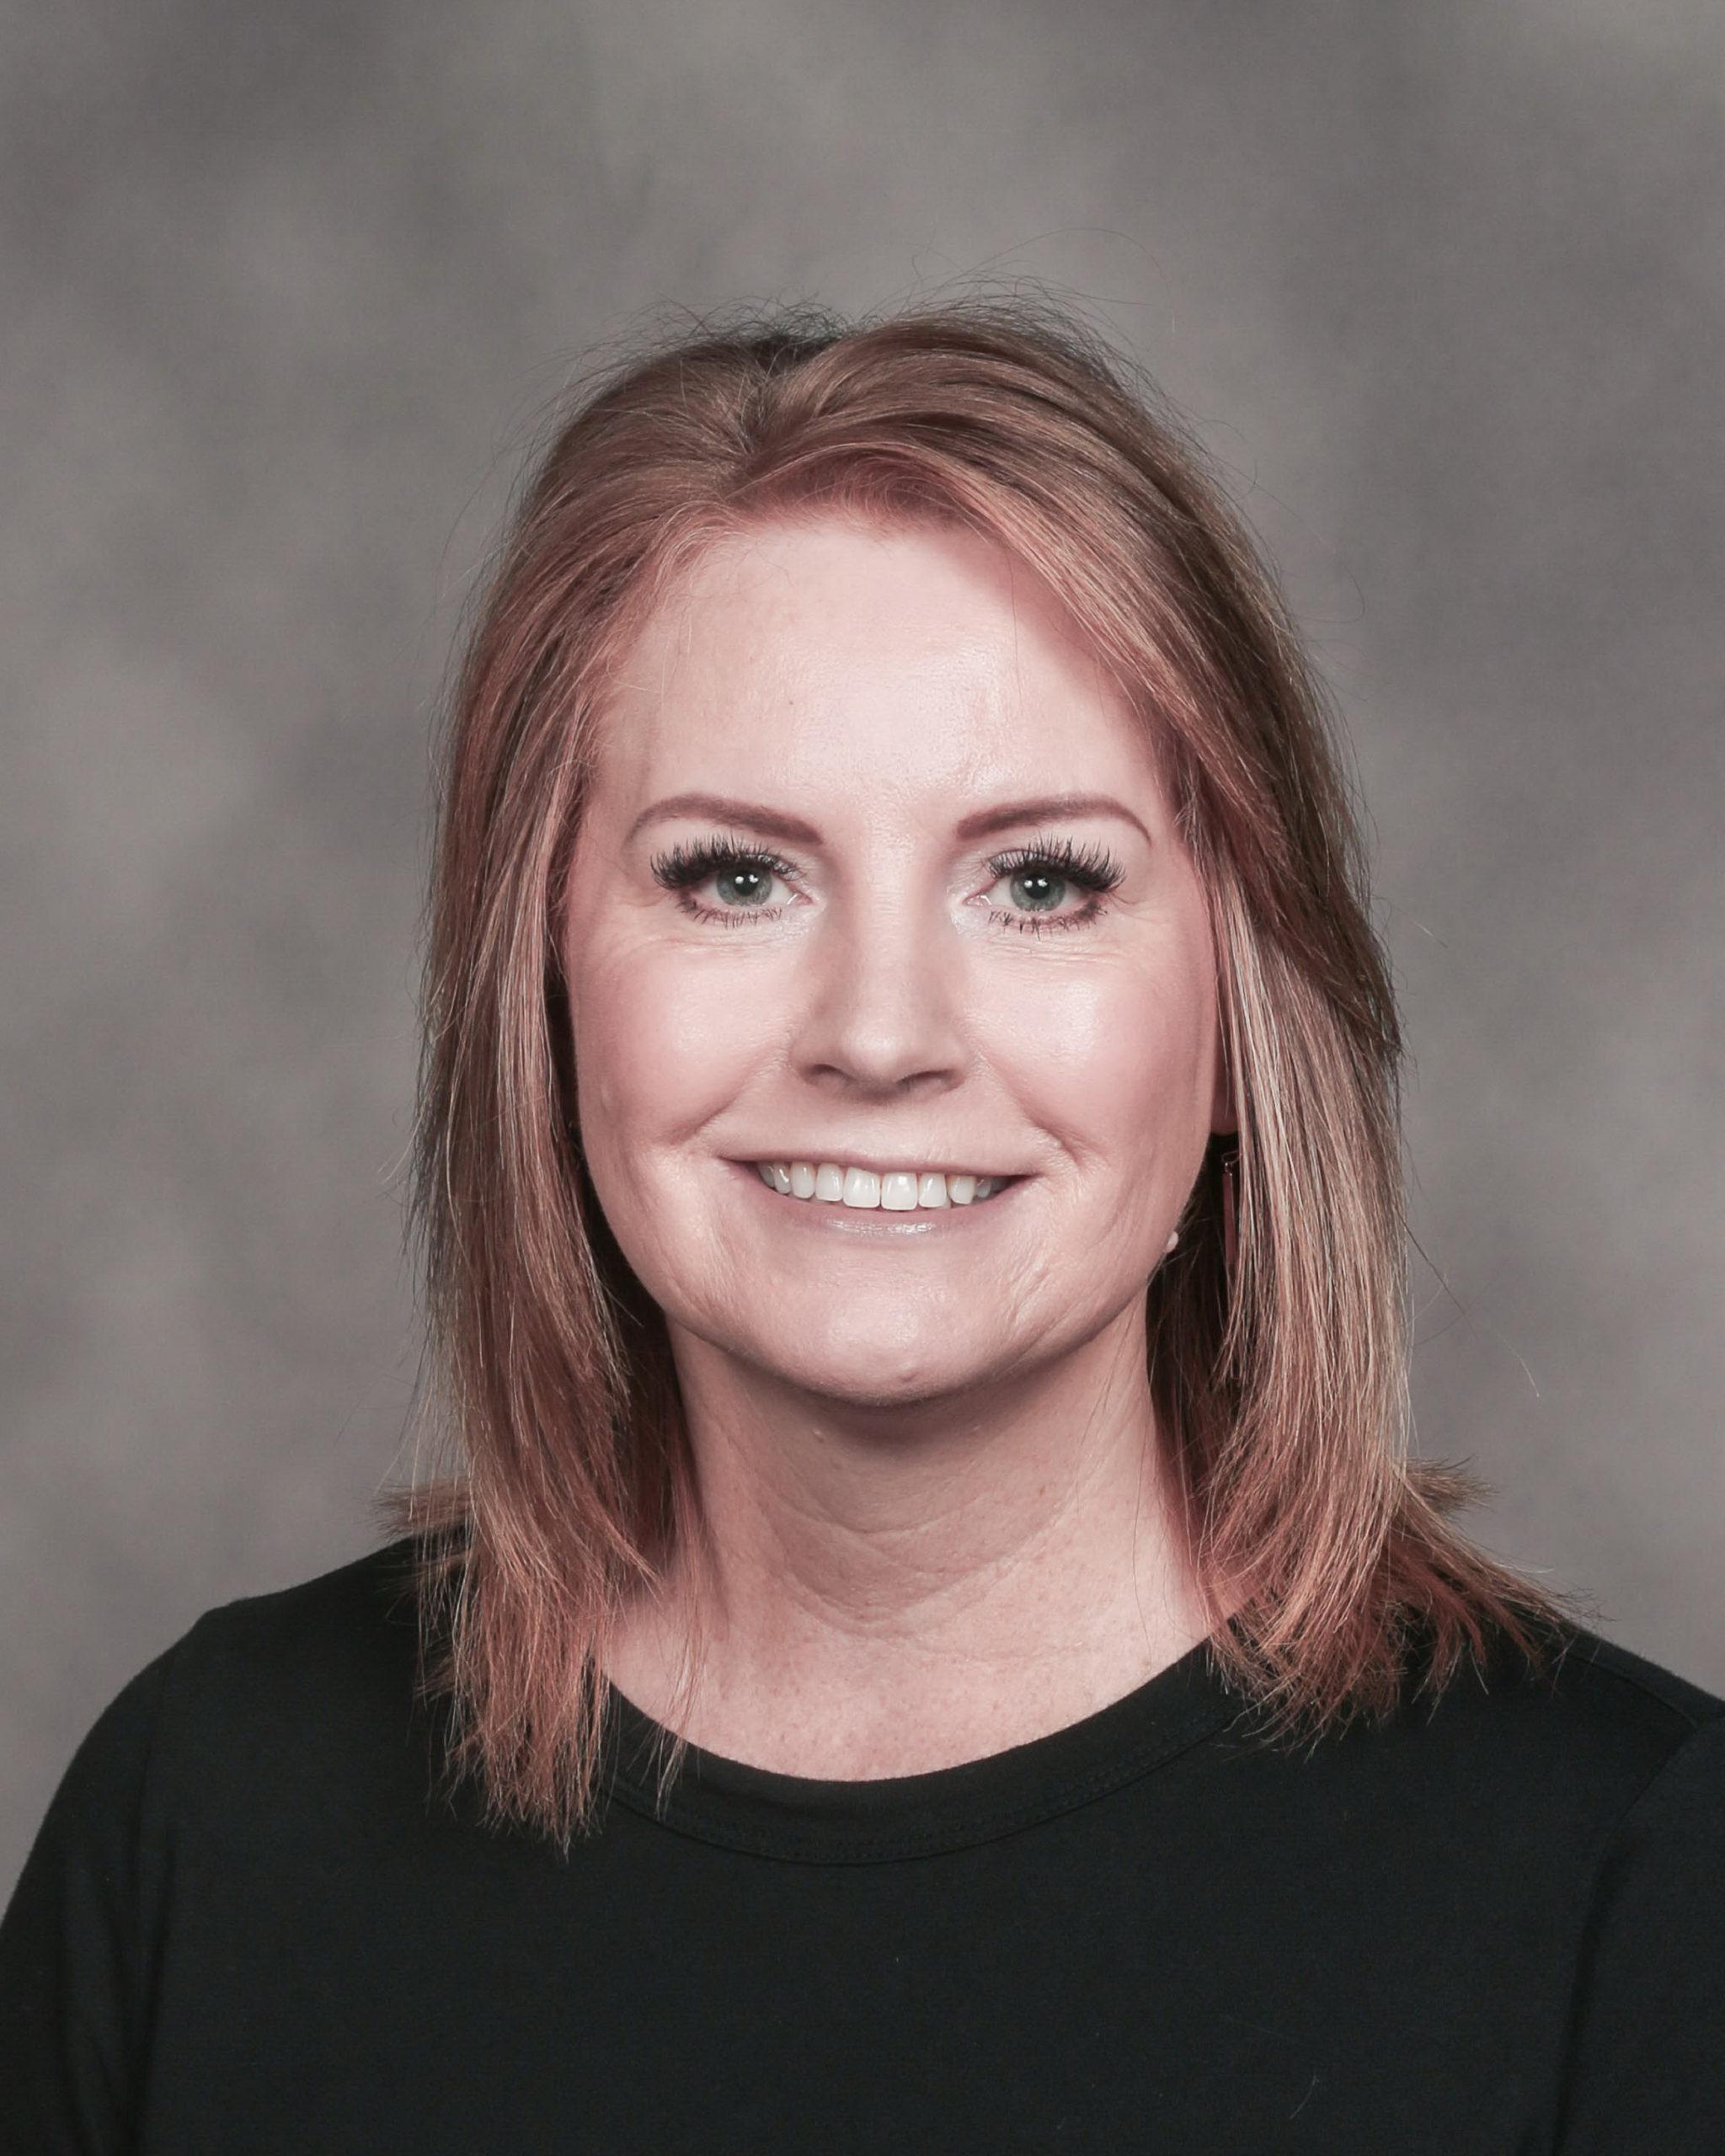 Erin Kelley